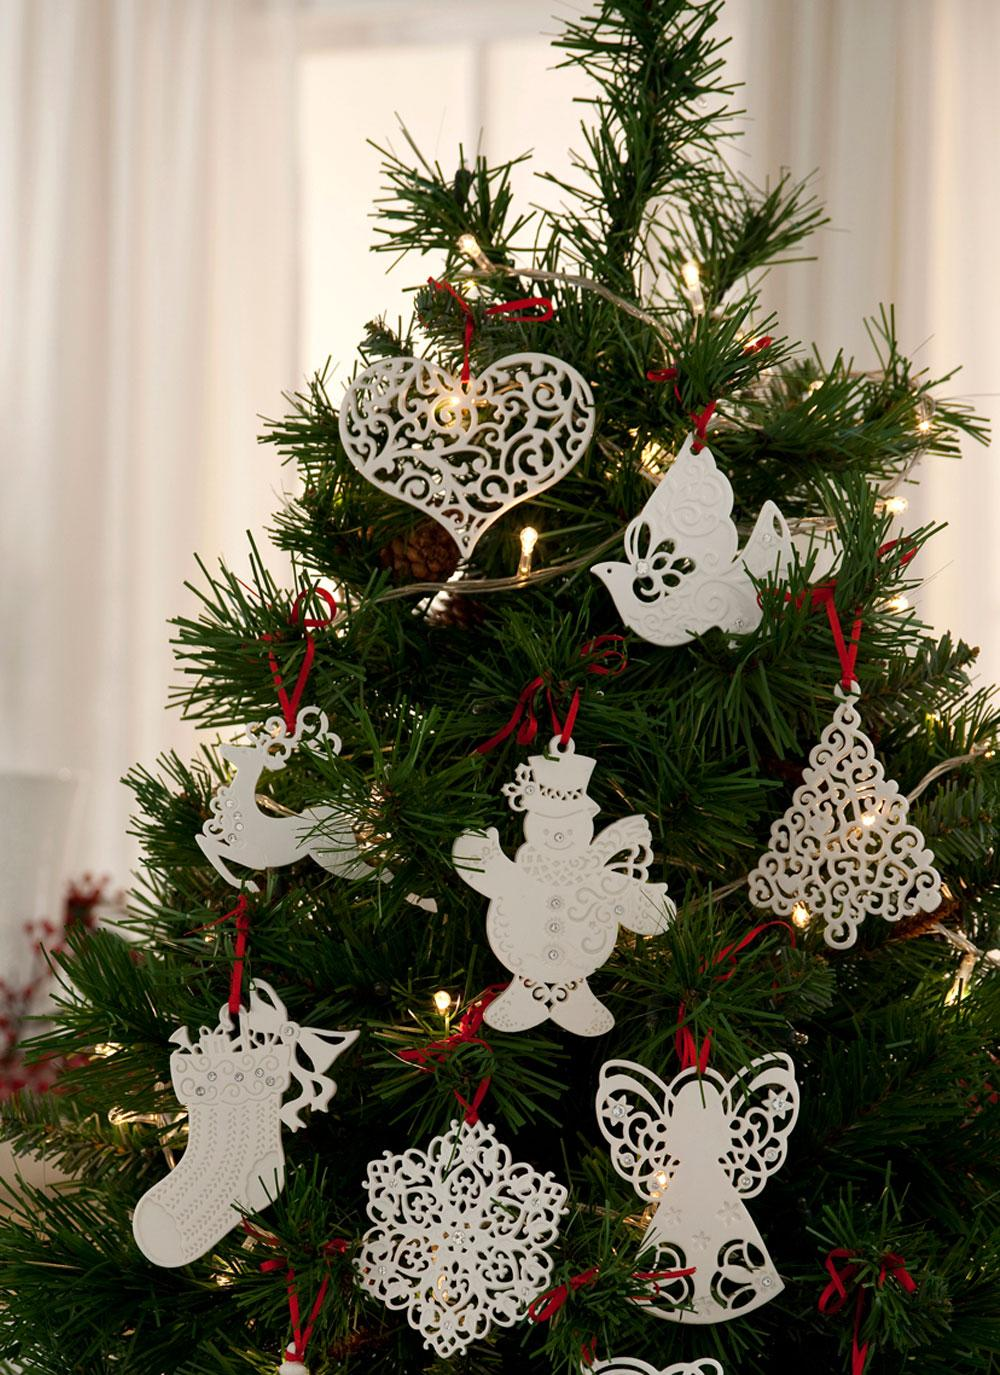 Irish Christmas Tree Ornaments